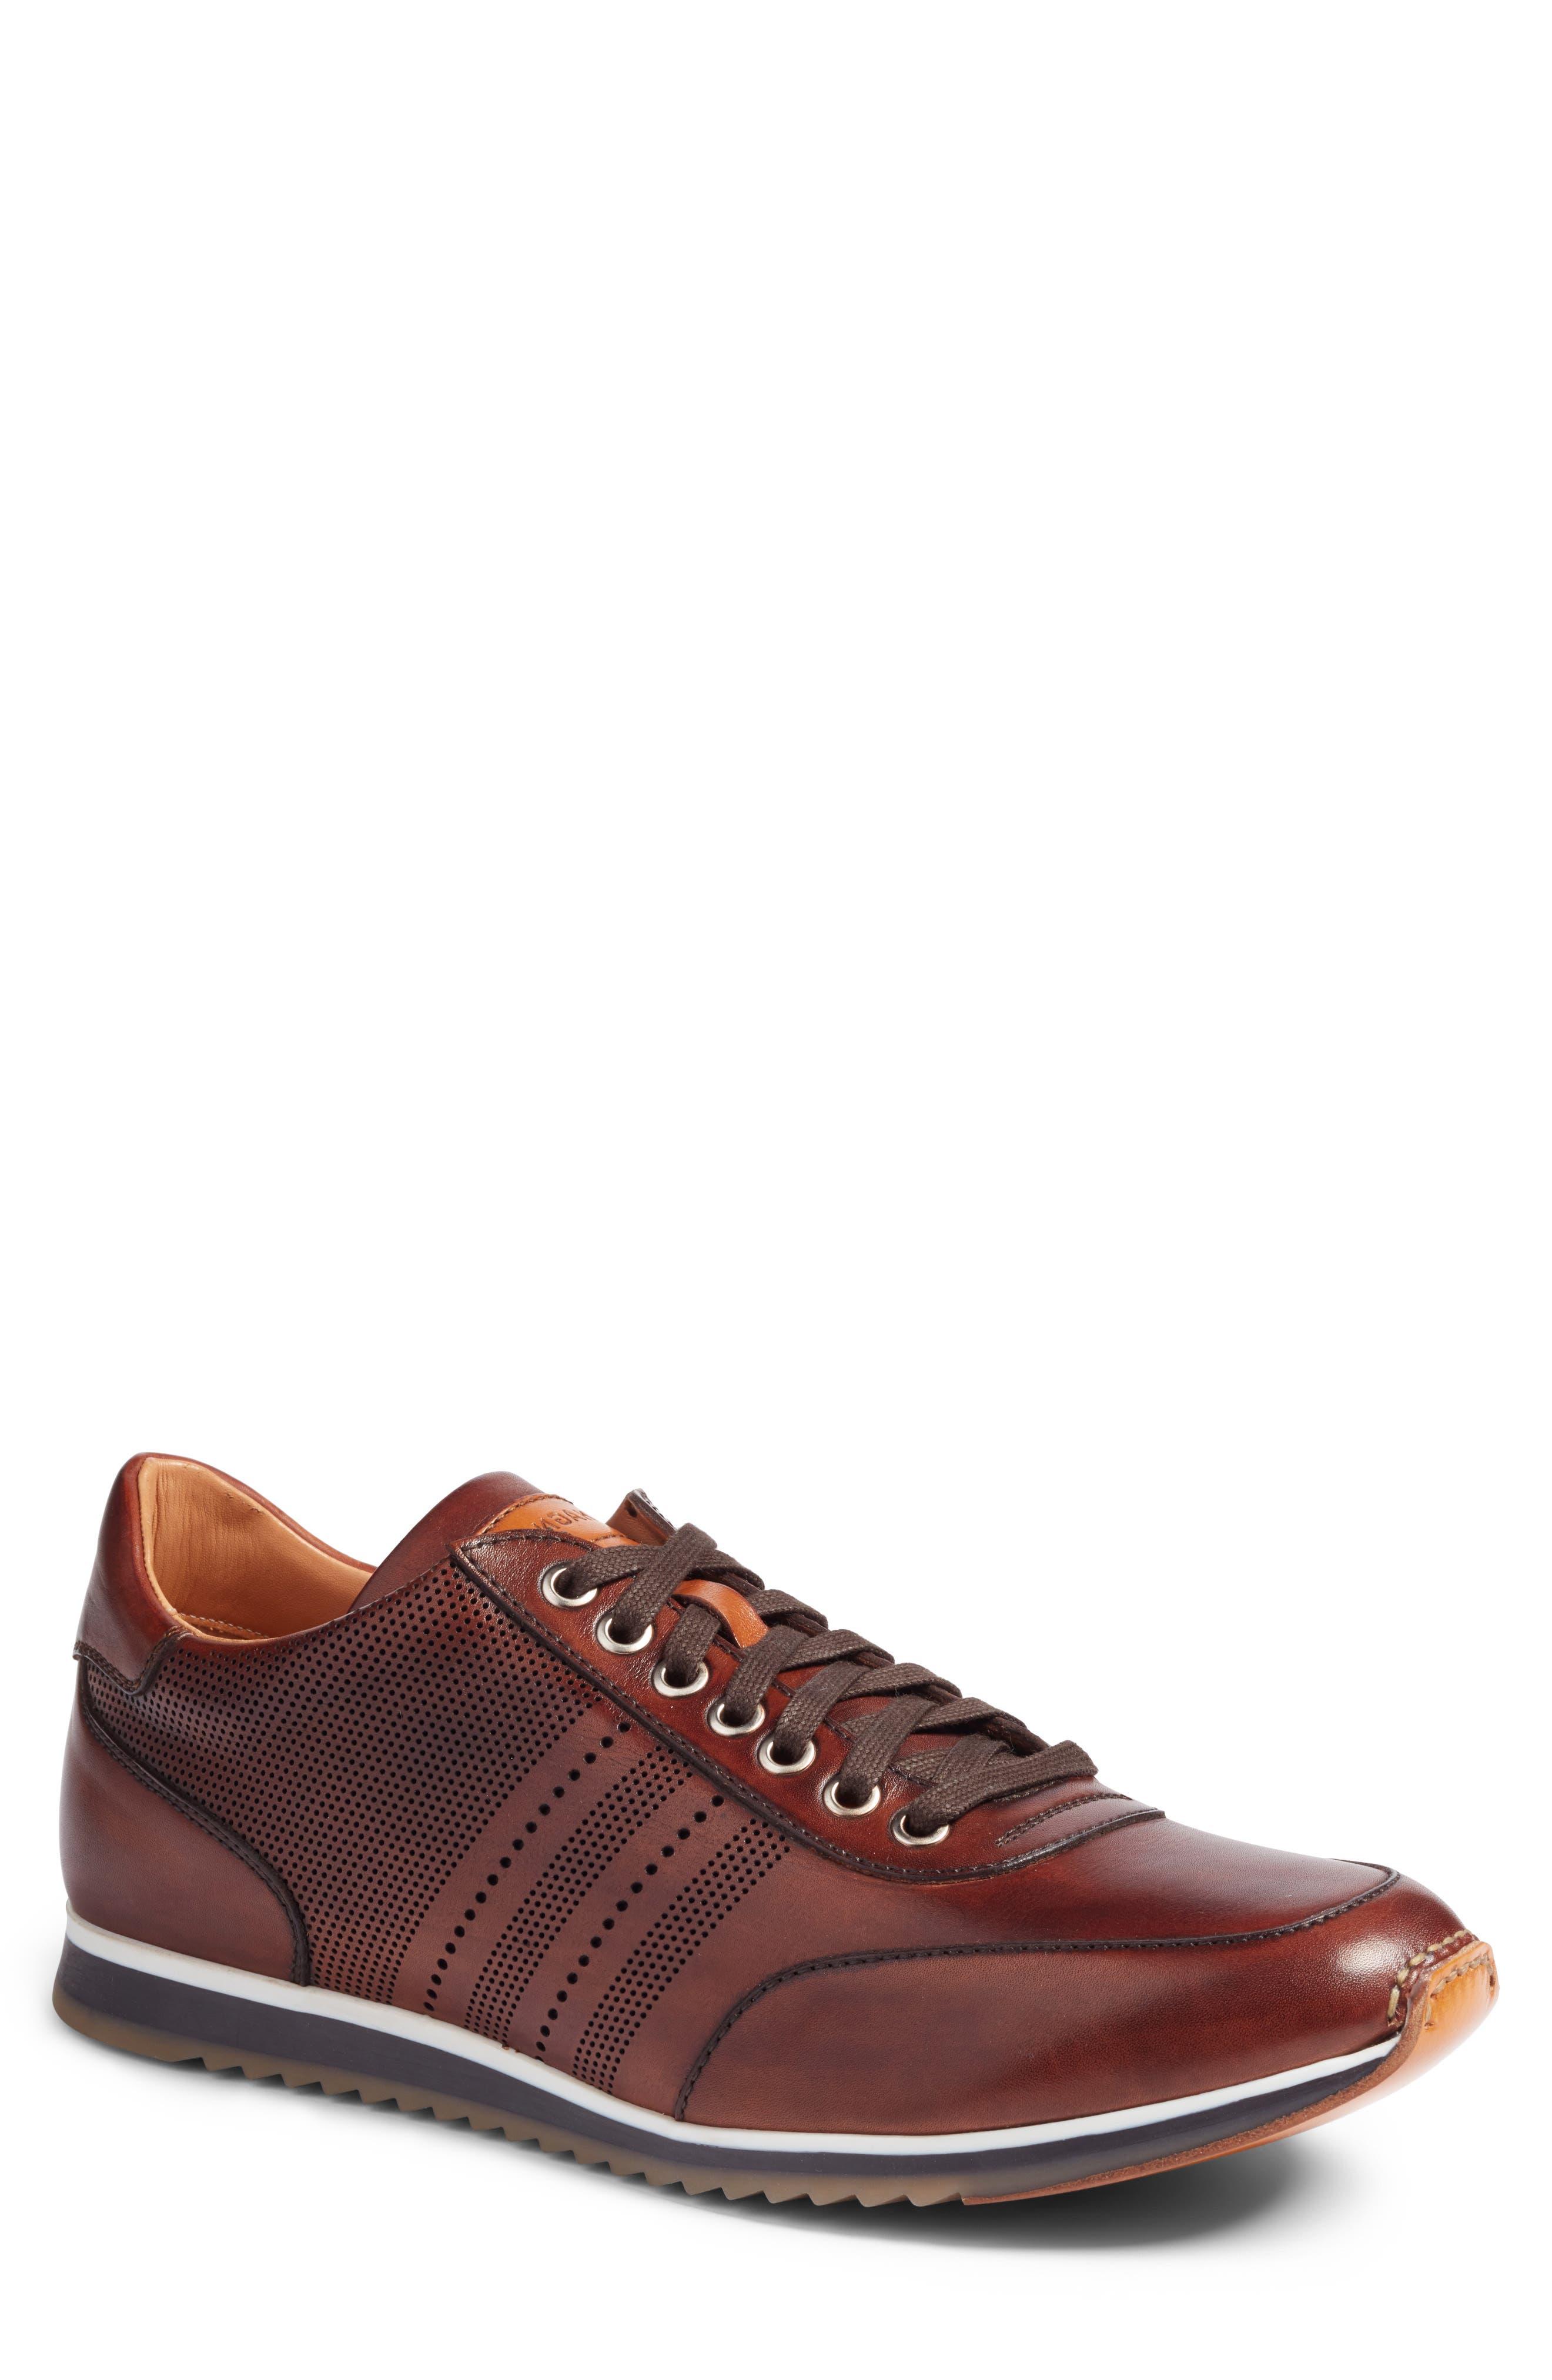 Magnanni Merino Sneaker (Men)